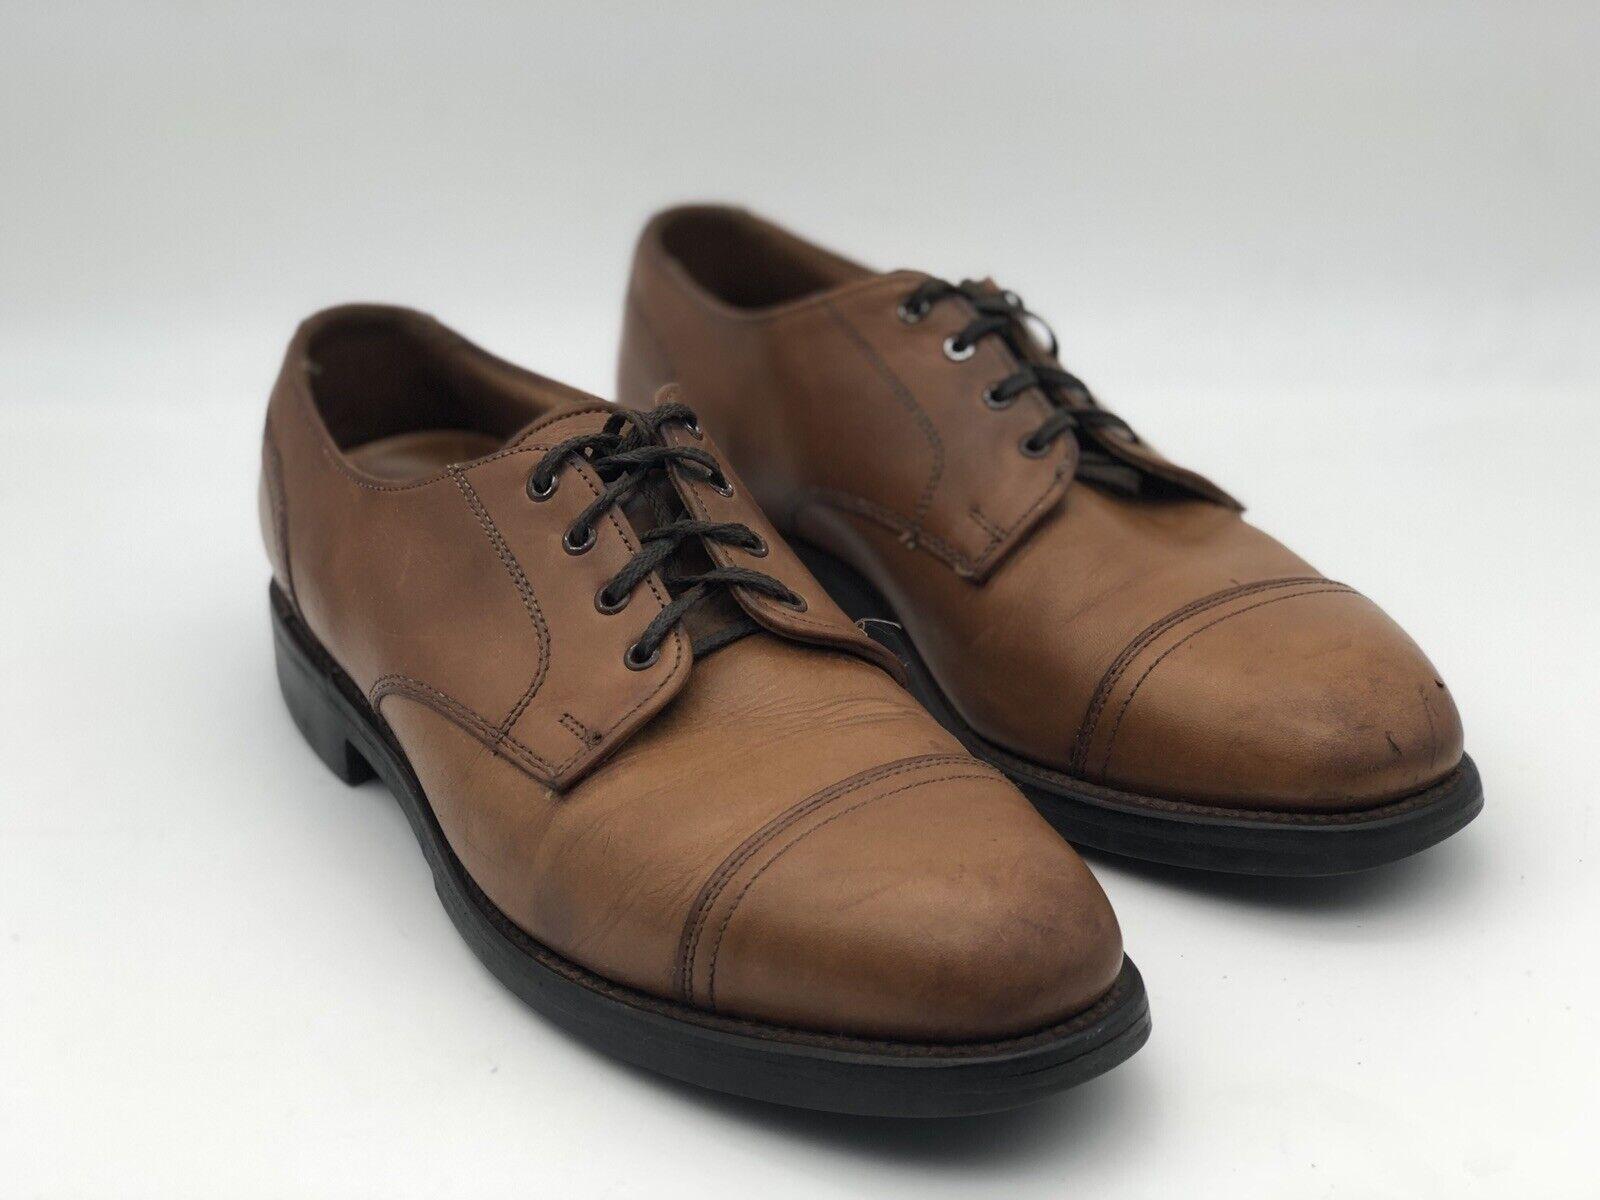 Allen Edmonds Size 9 B Walnut Cap Toe Double Stitch Oxfords Rubber Sole